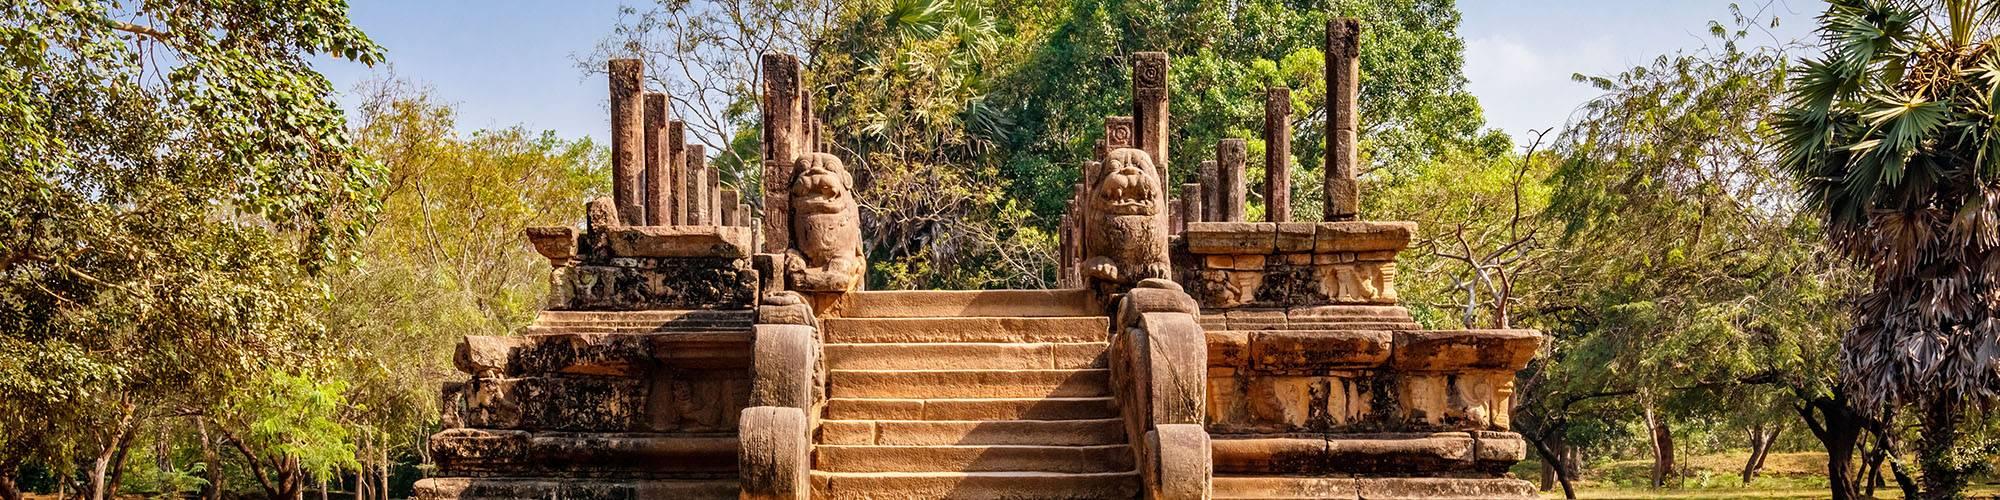 Sri Lanka Kultur und Traditionen